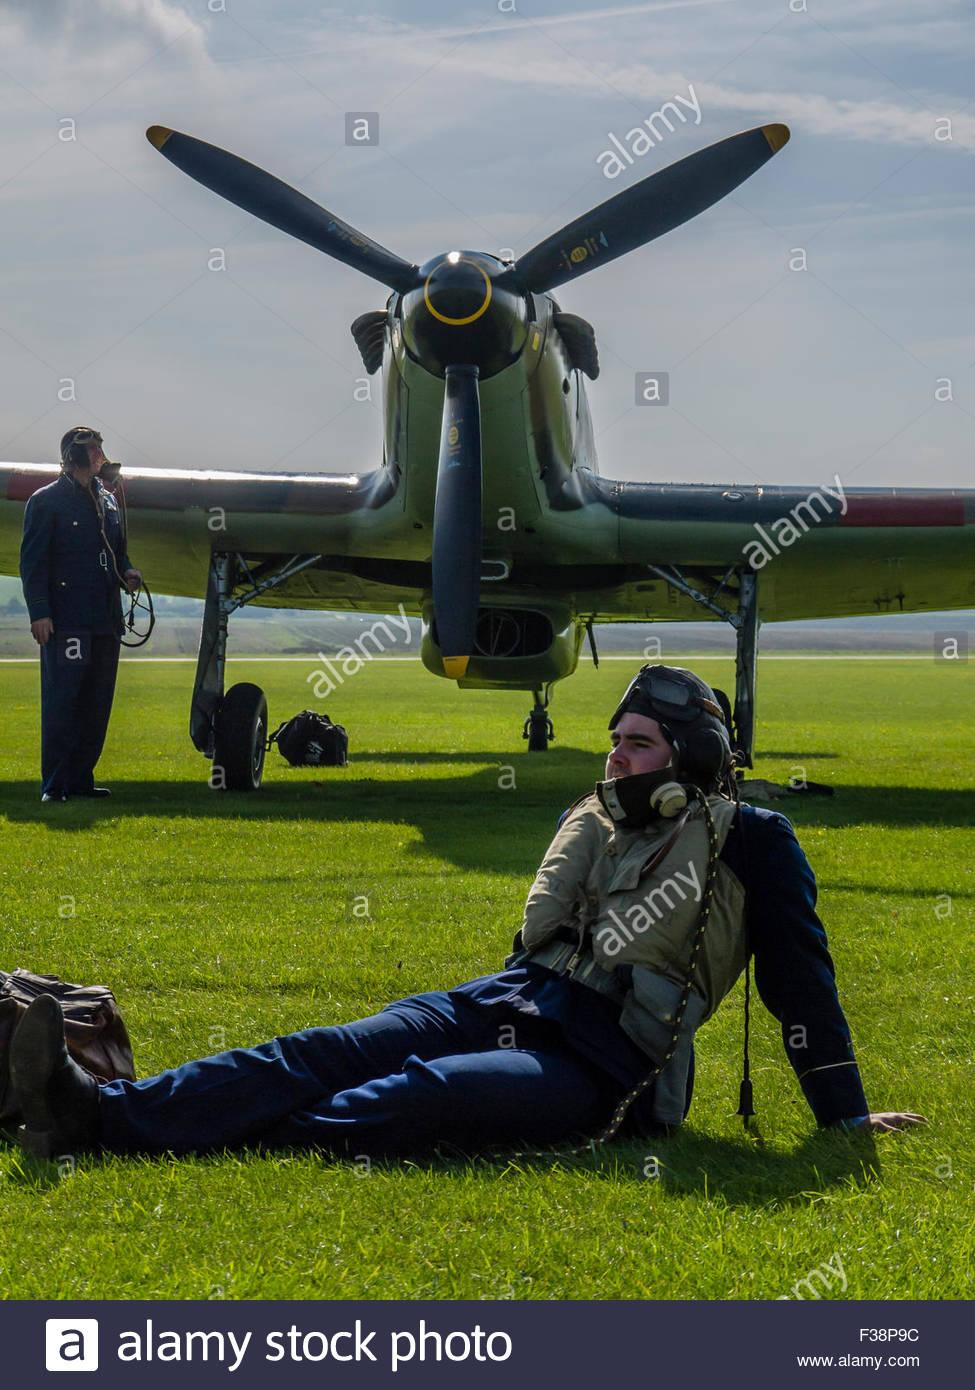 Duxford Battle of Britain 2015 Hurricane Pilot and Ground Crew waiting order to Scramble 1940's England UK - Stock Image